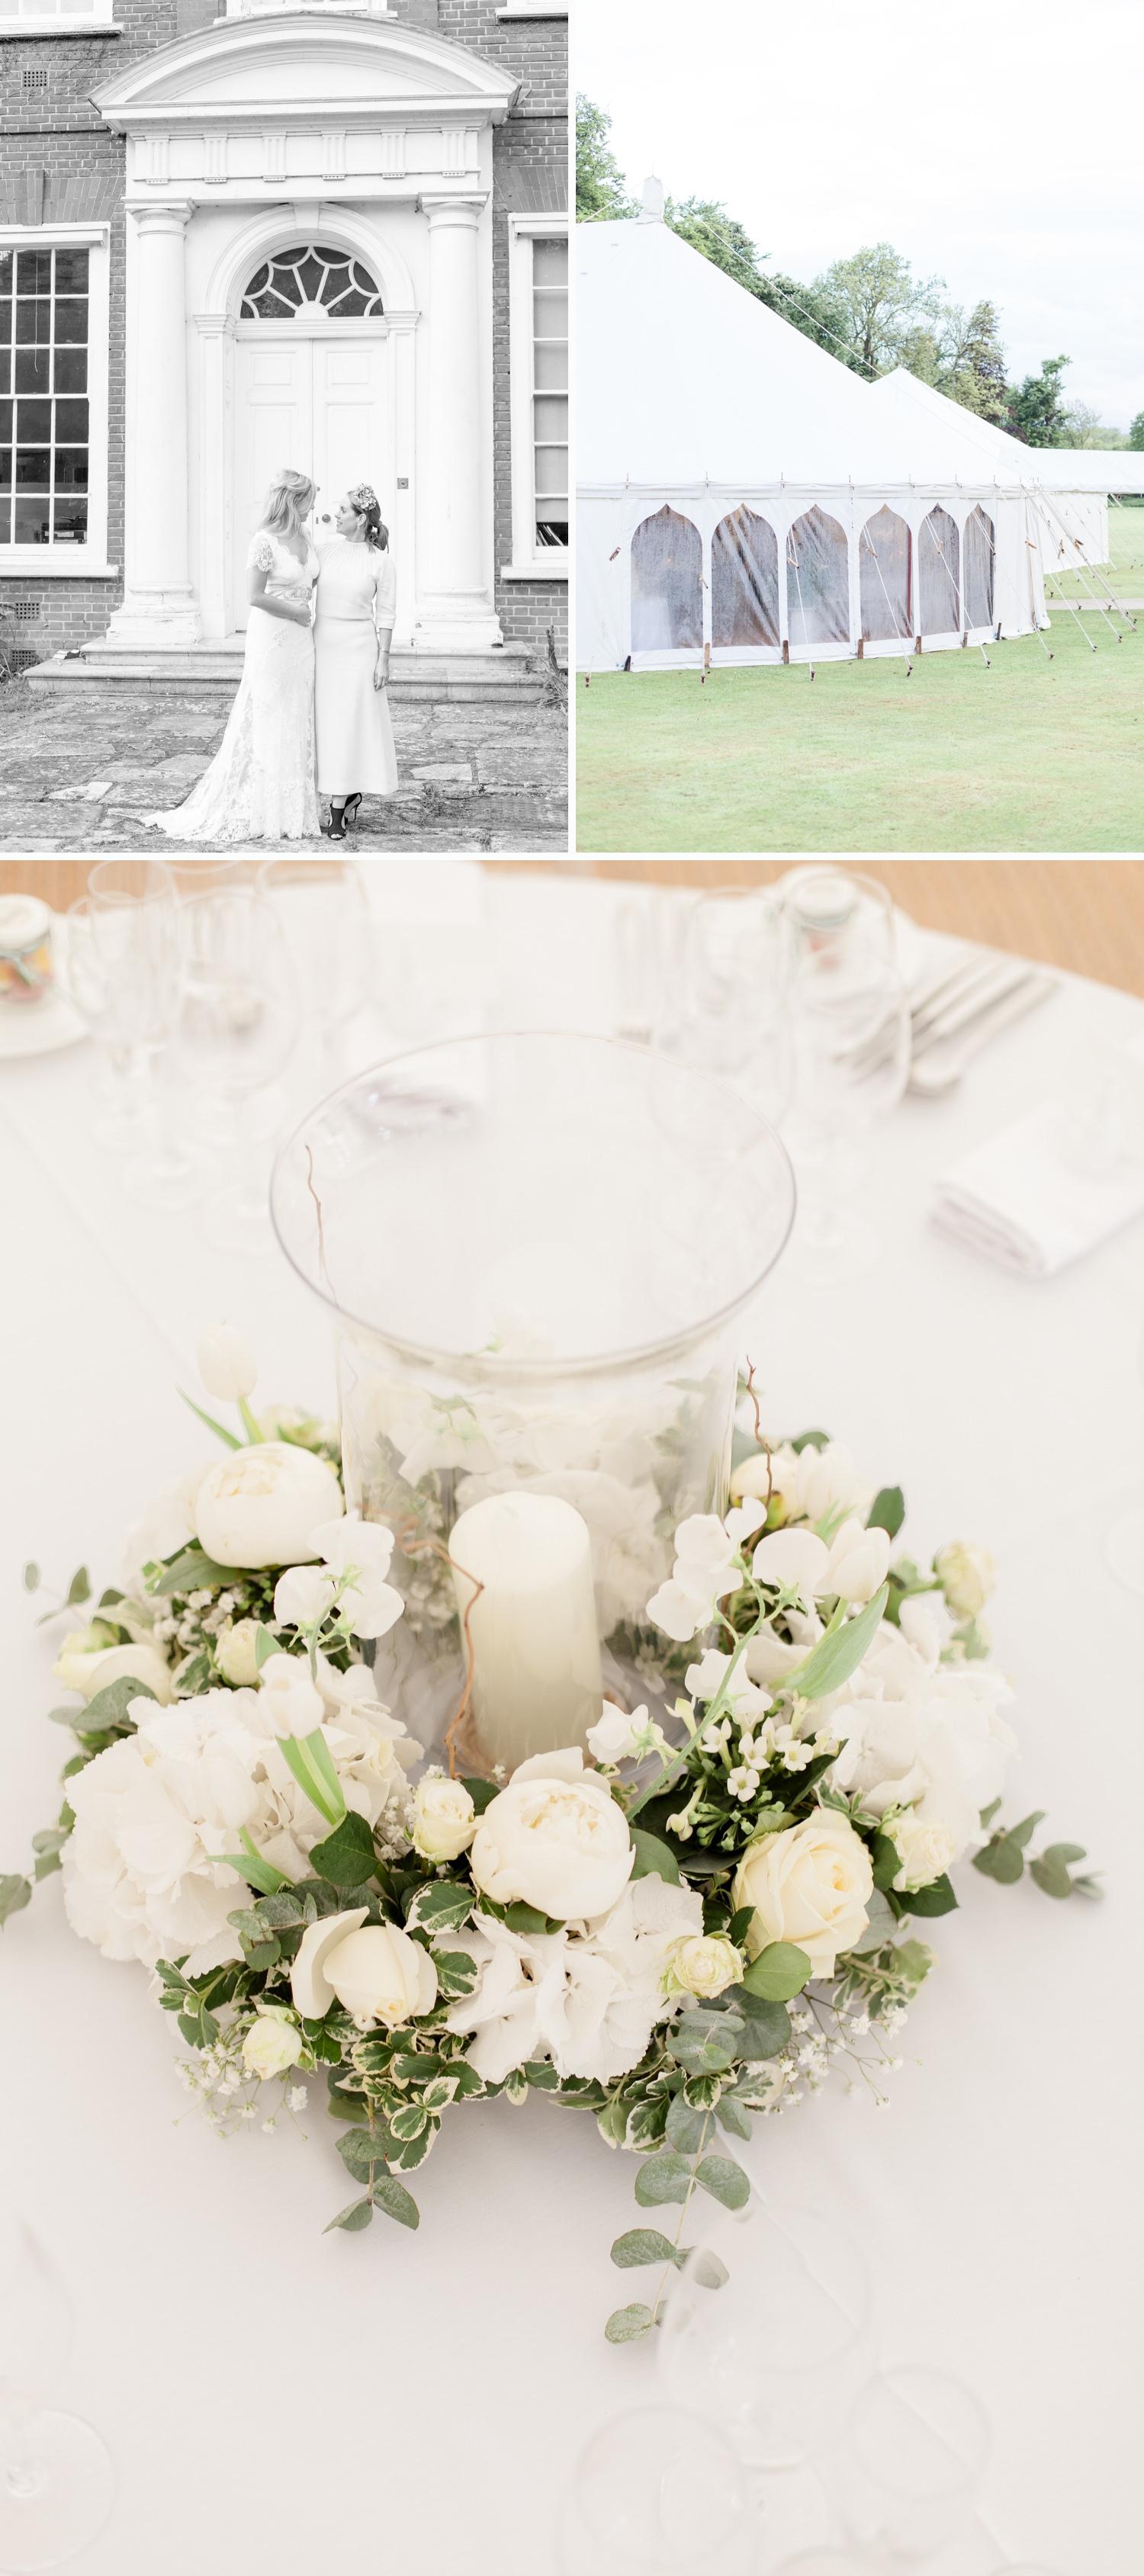 Emily & Jonathan's Cambridgeshire wedding - a marquee wedding